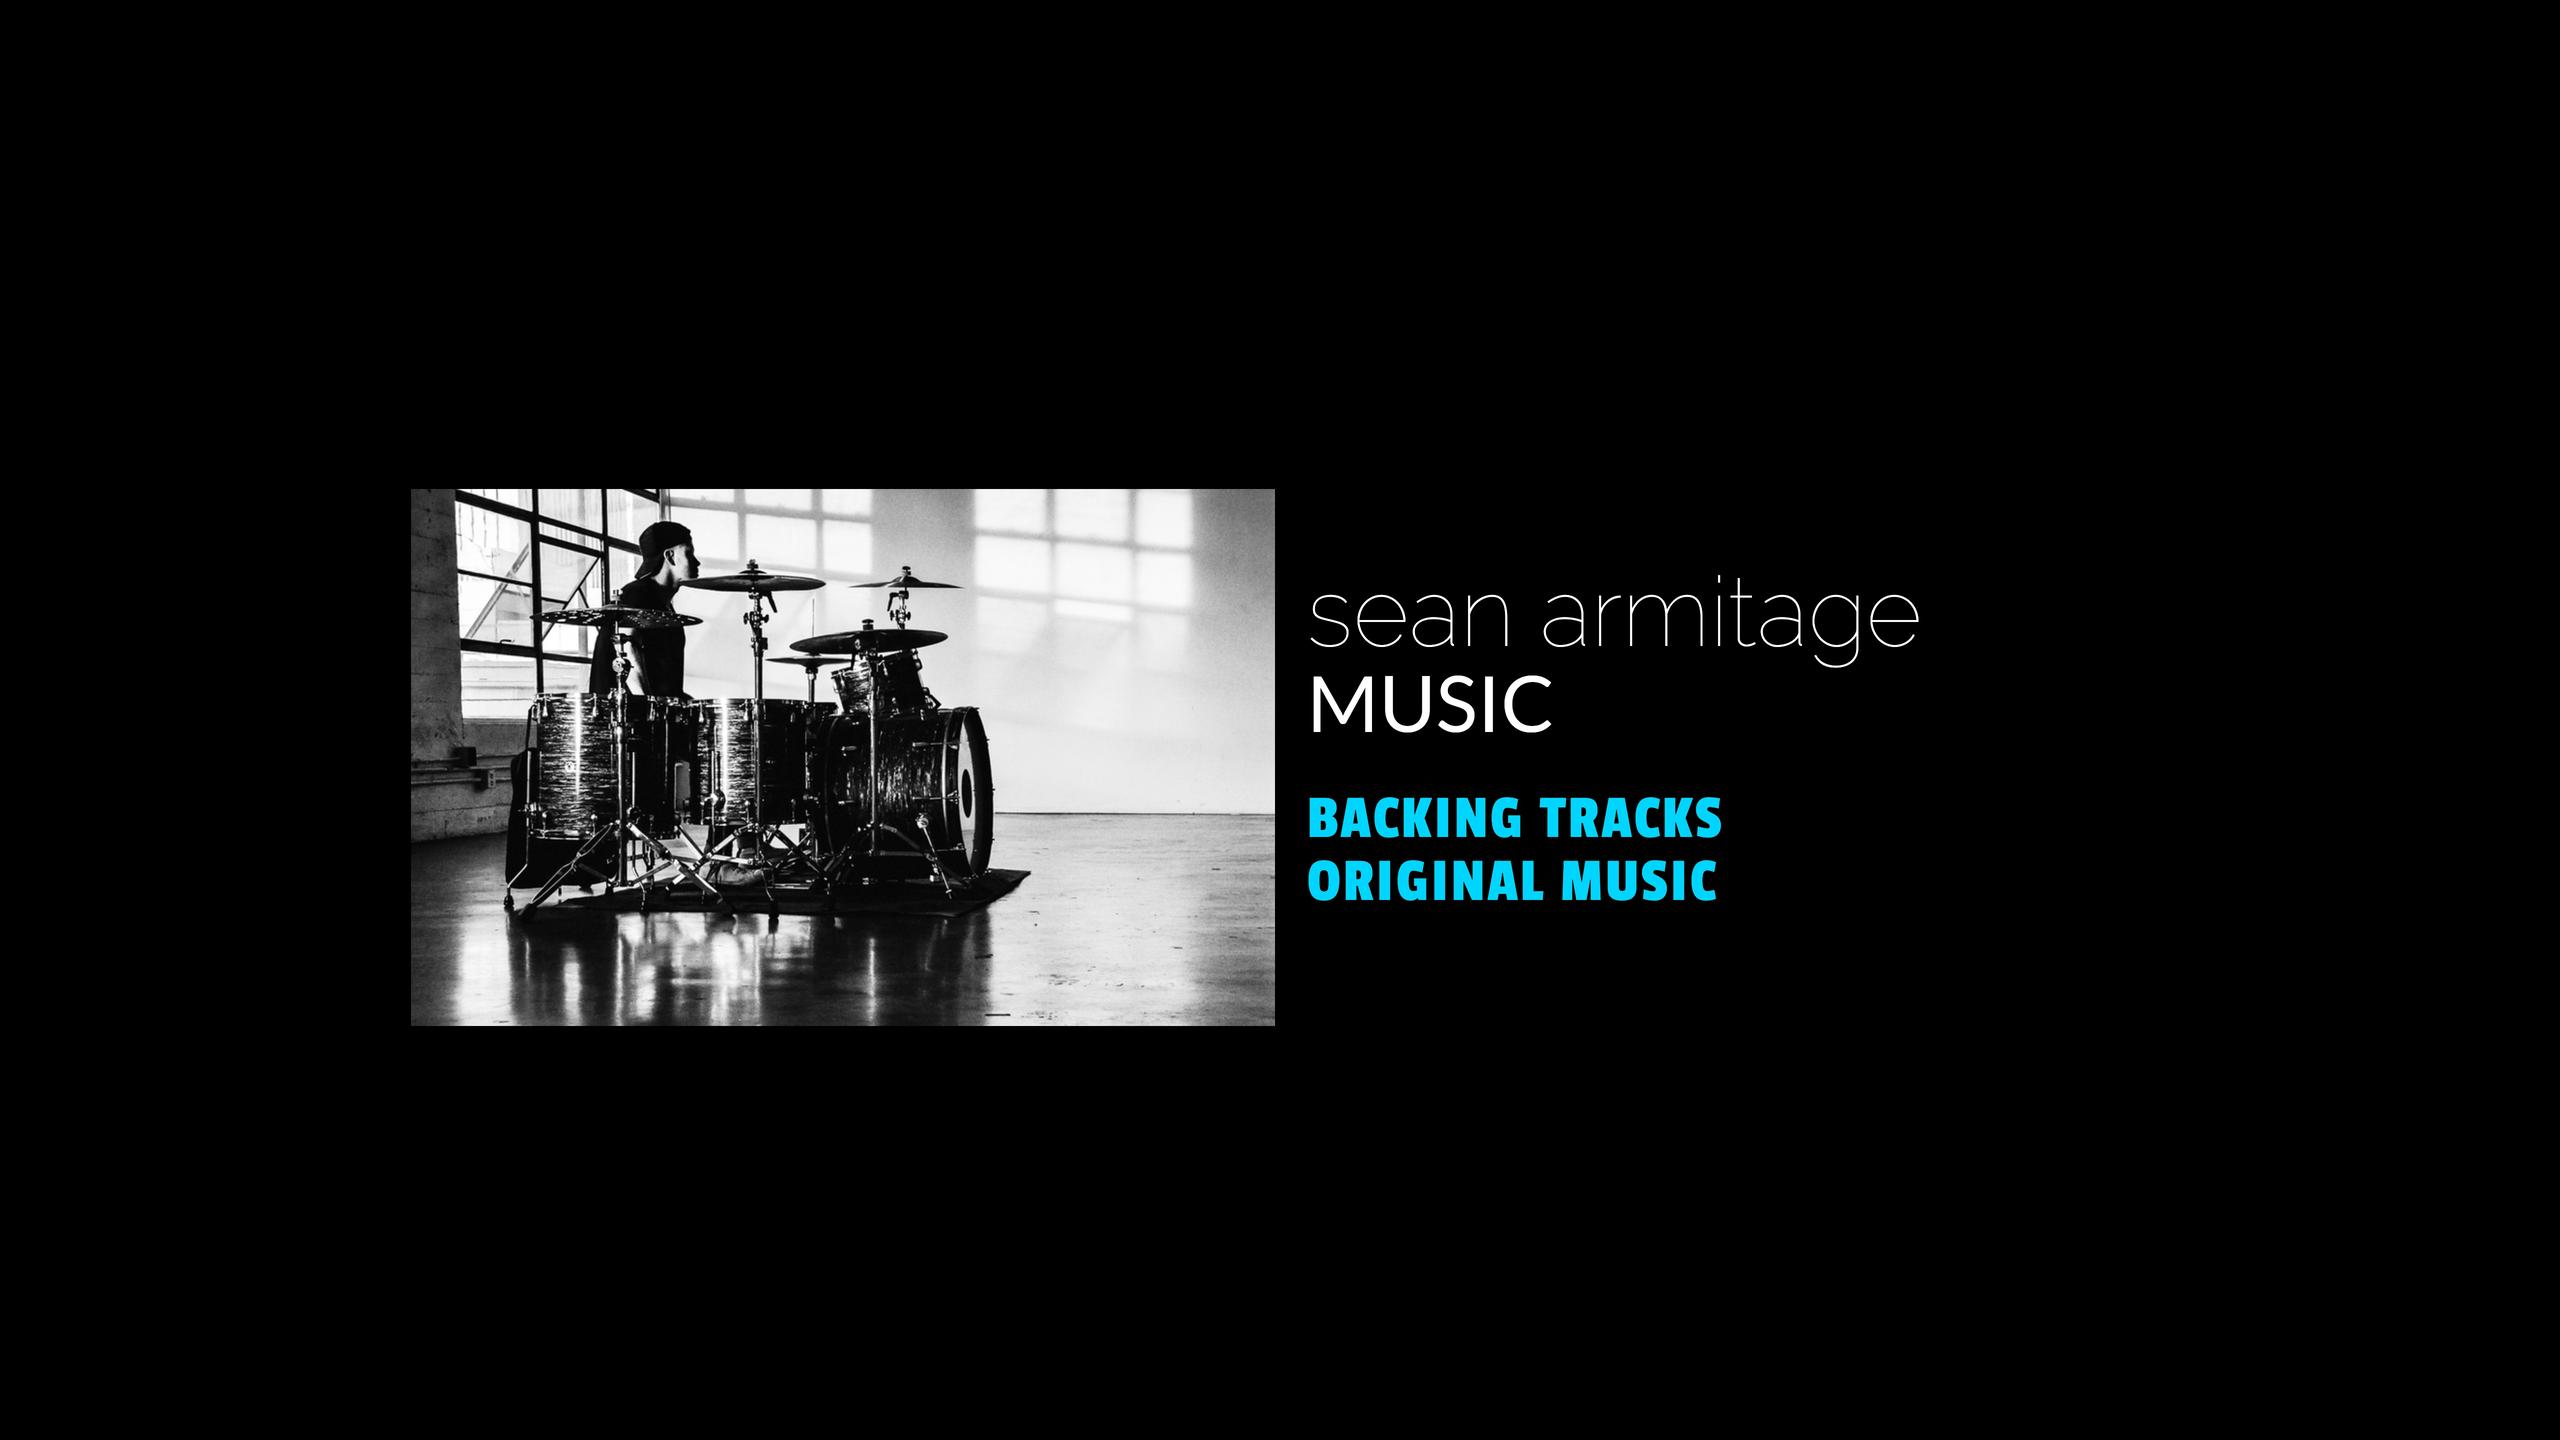 drummer, sean armitage